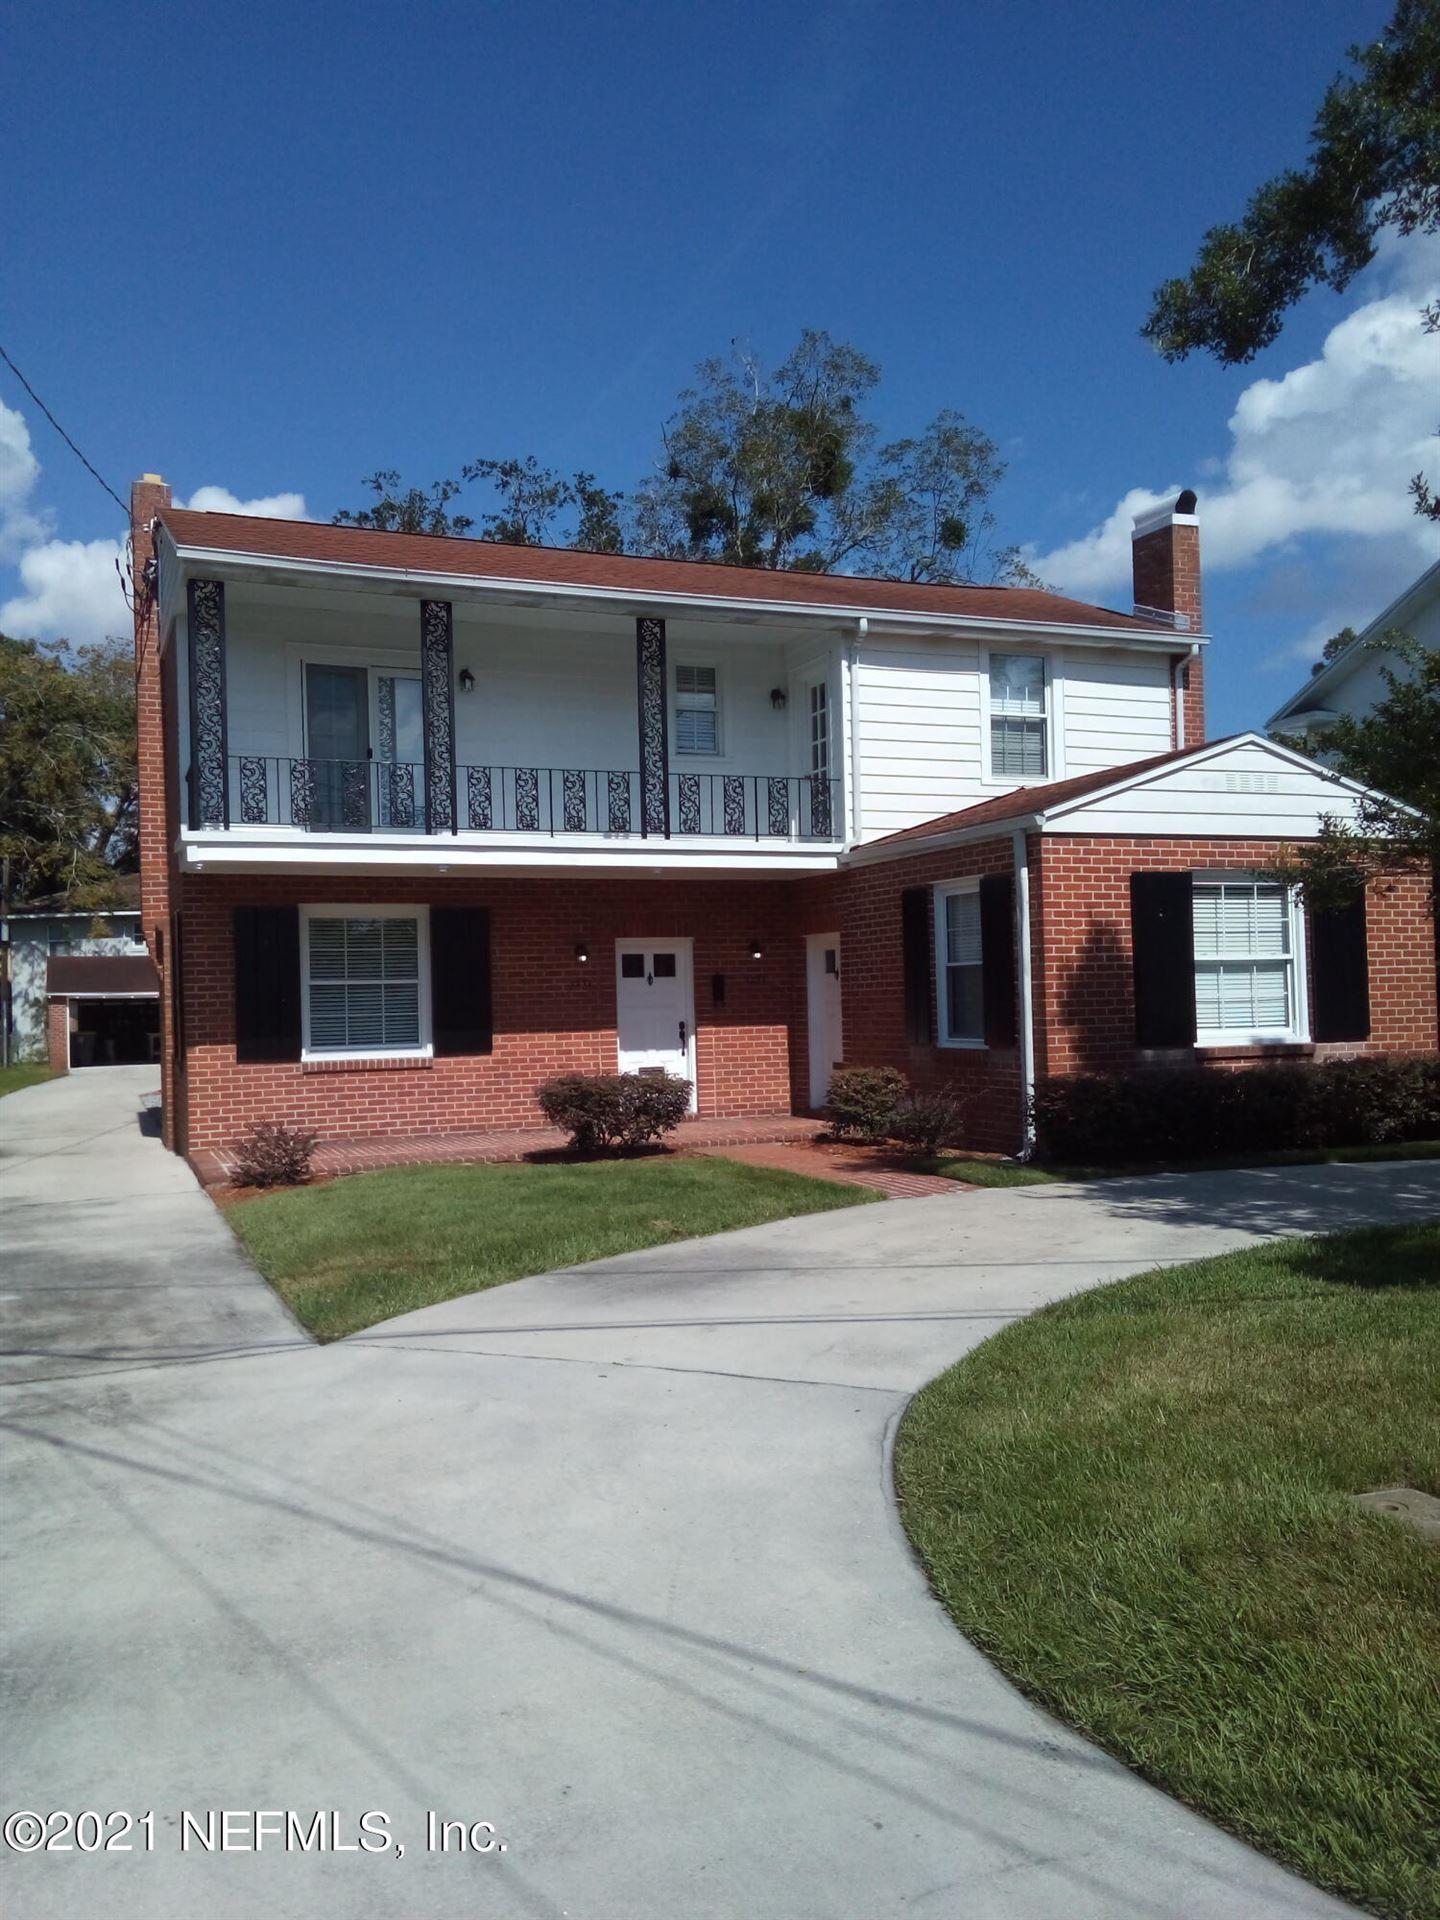 Photo of 1271 BELMONT TER, JACKSONVILLE, FL 32207 (MLS # 1136856)